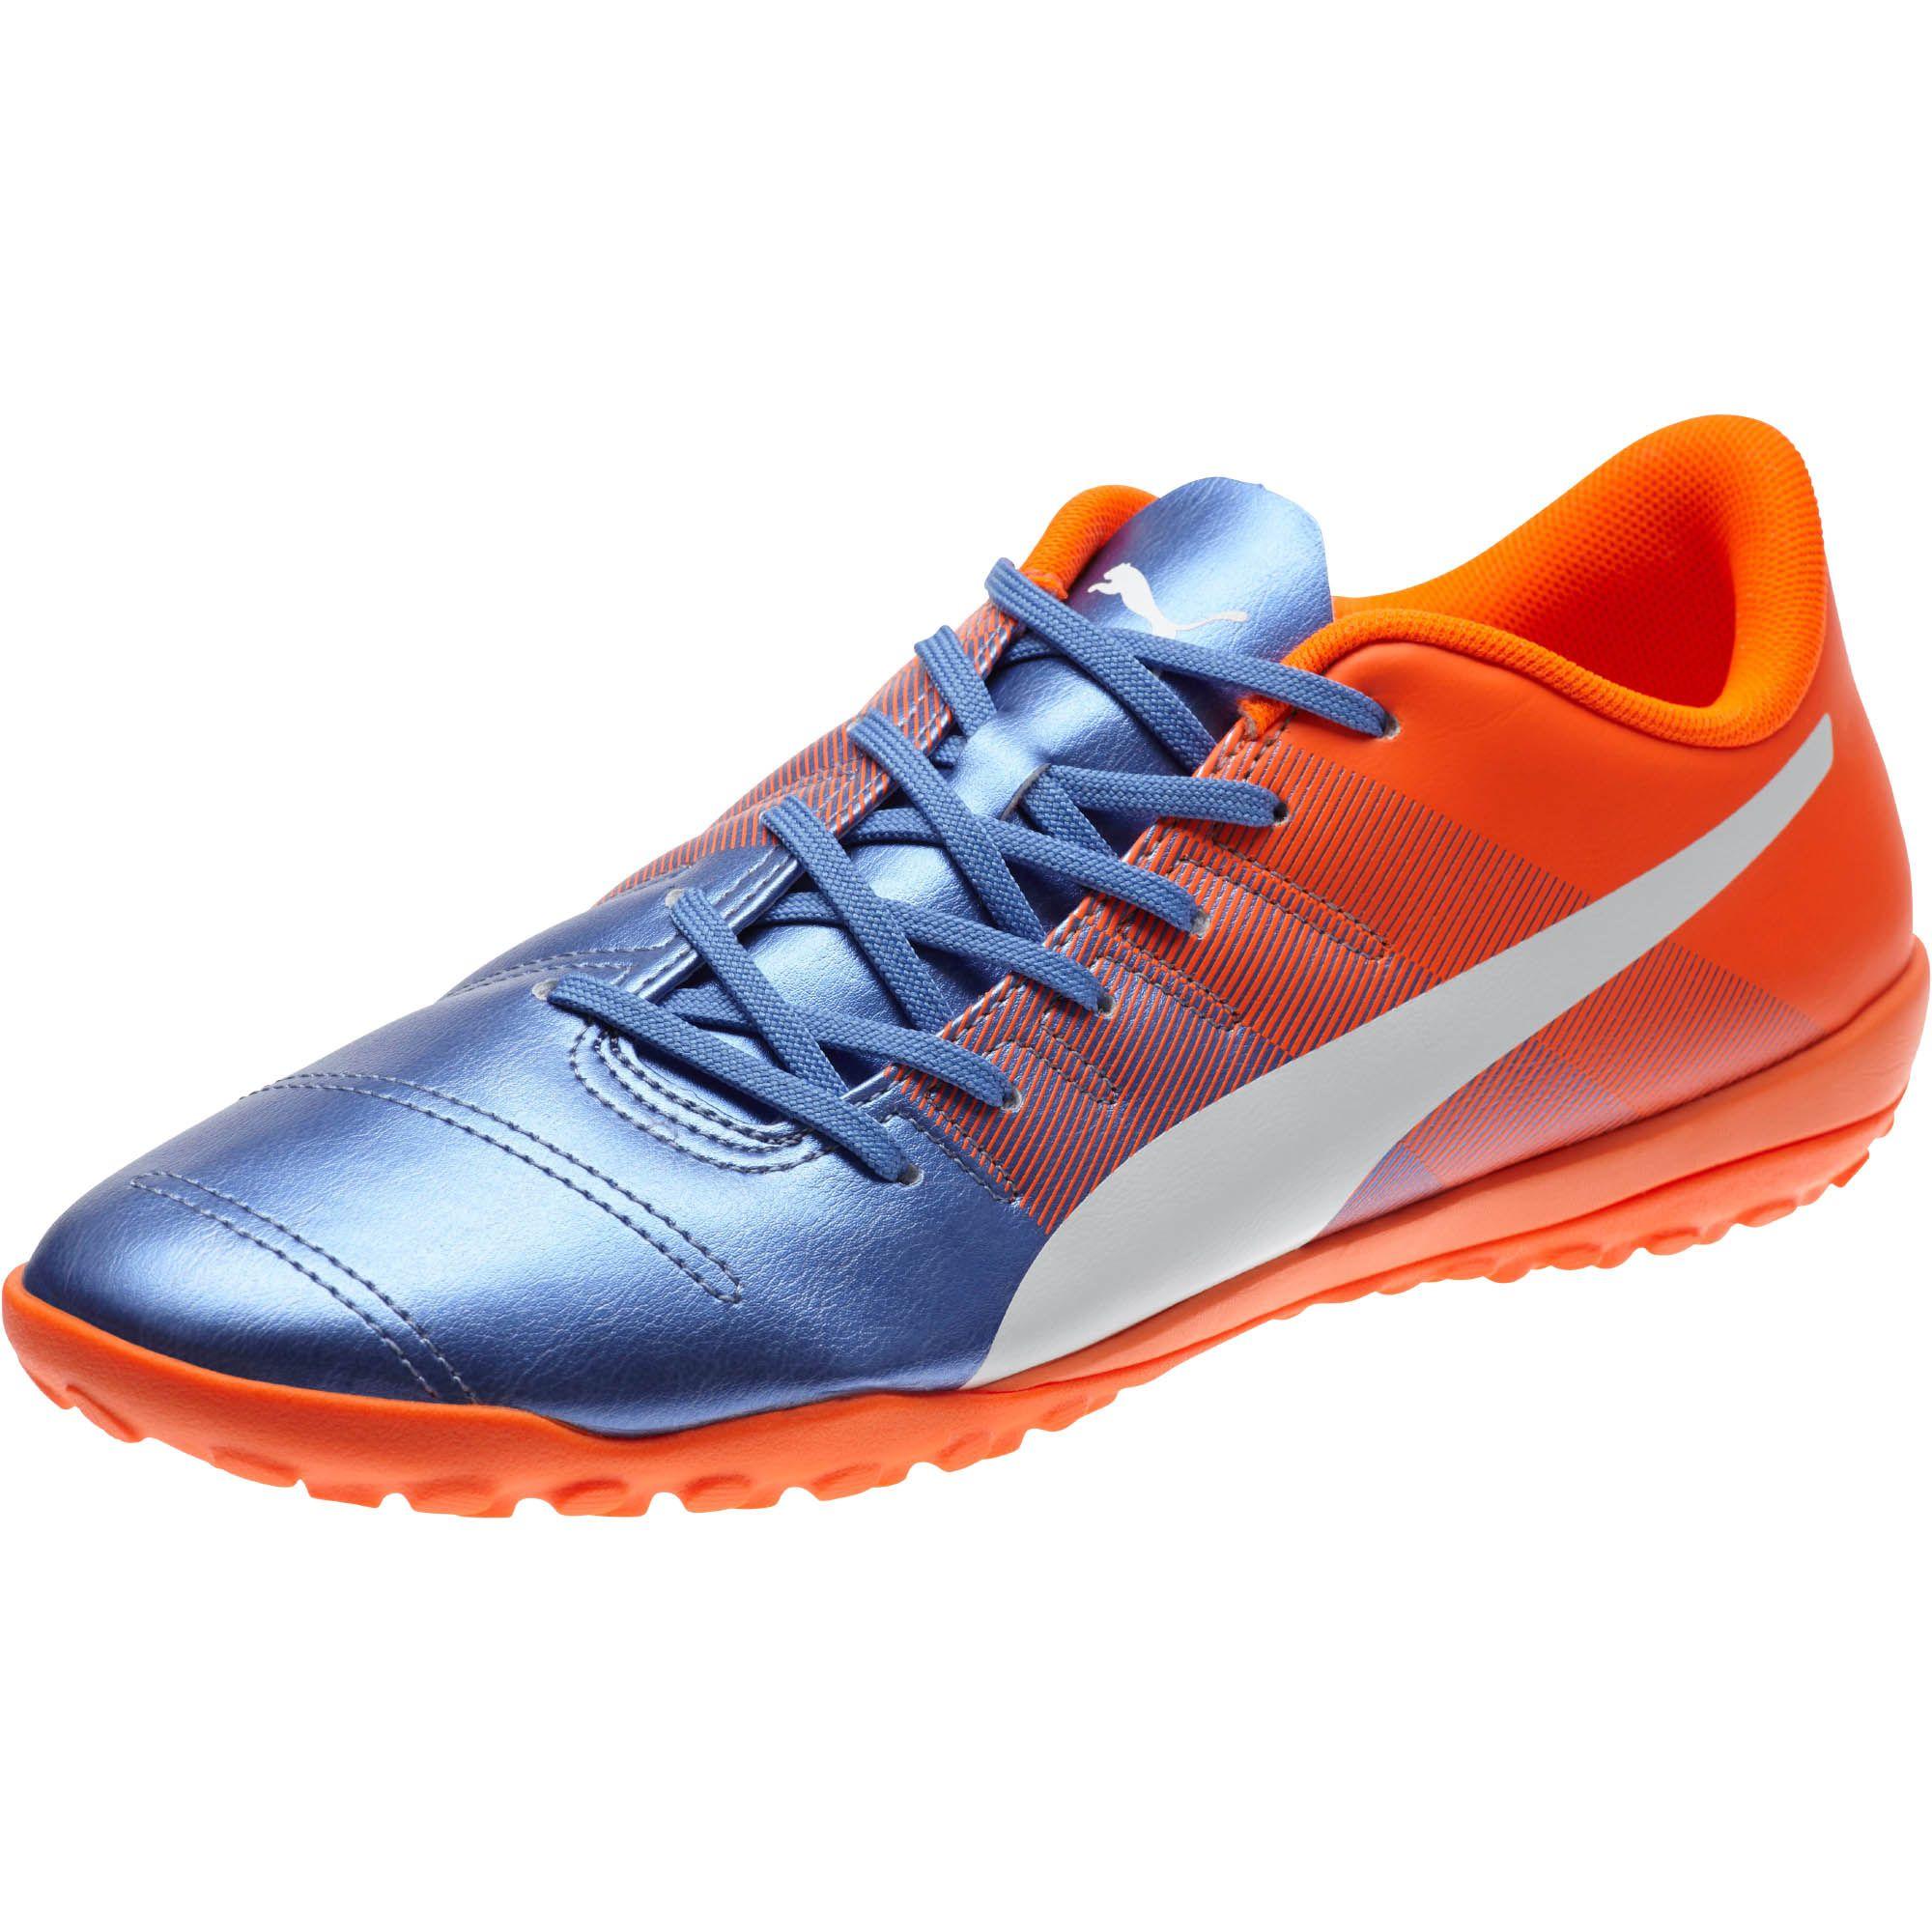 Puma Turf Soccer Shoes